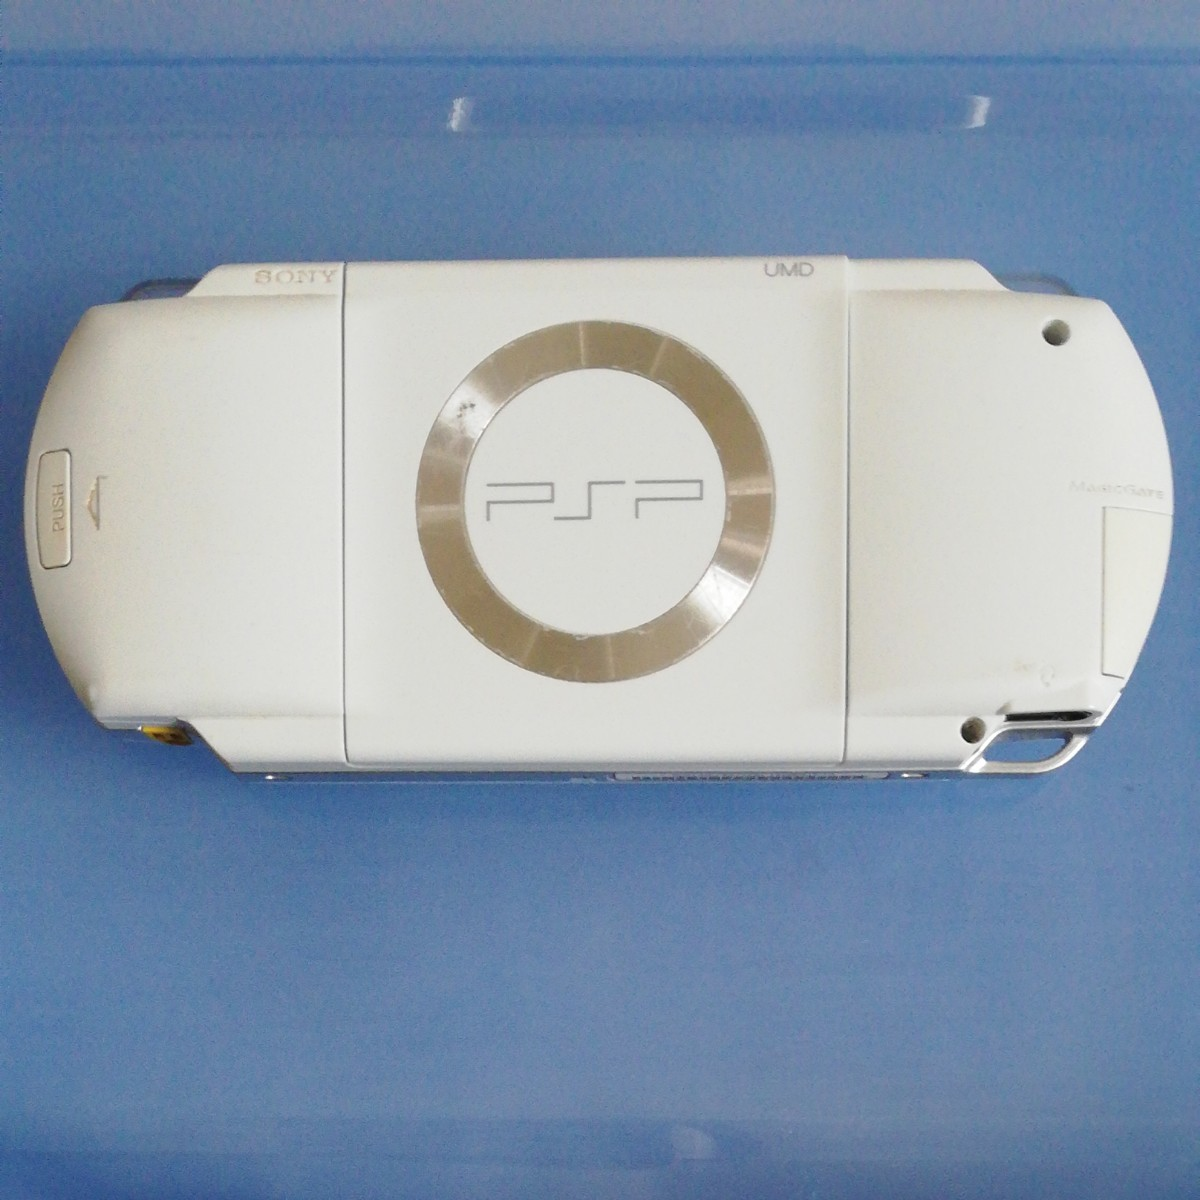 PSP1000 SONY(本体のみ)